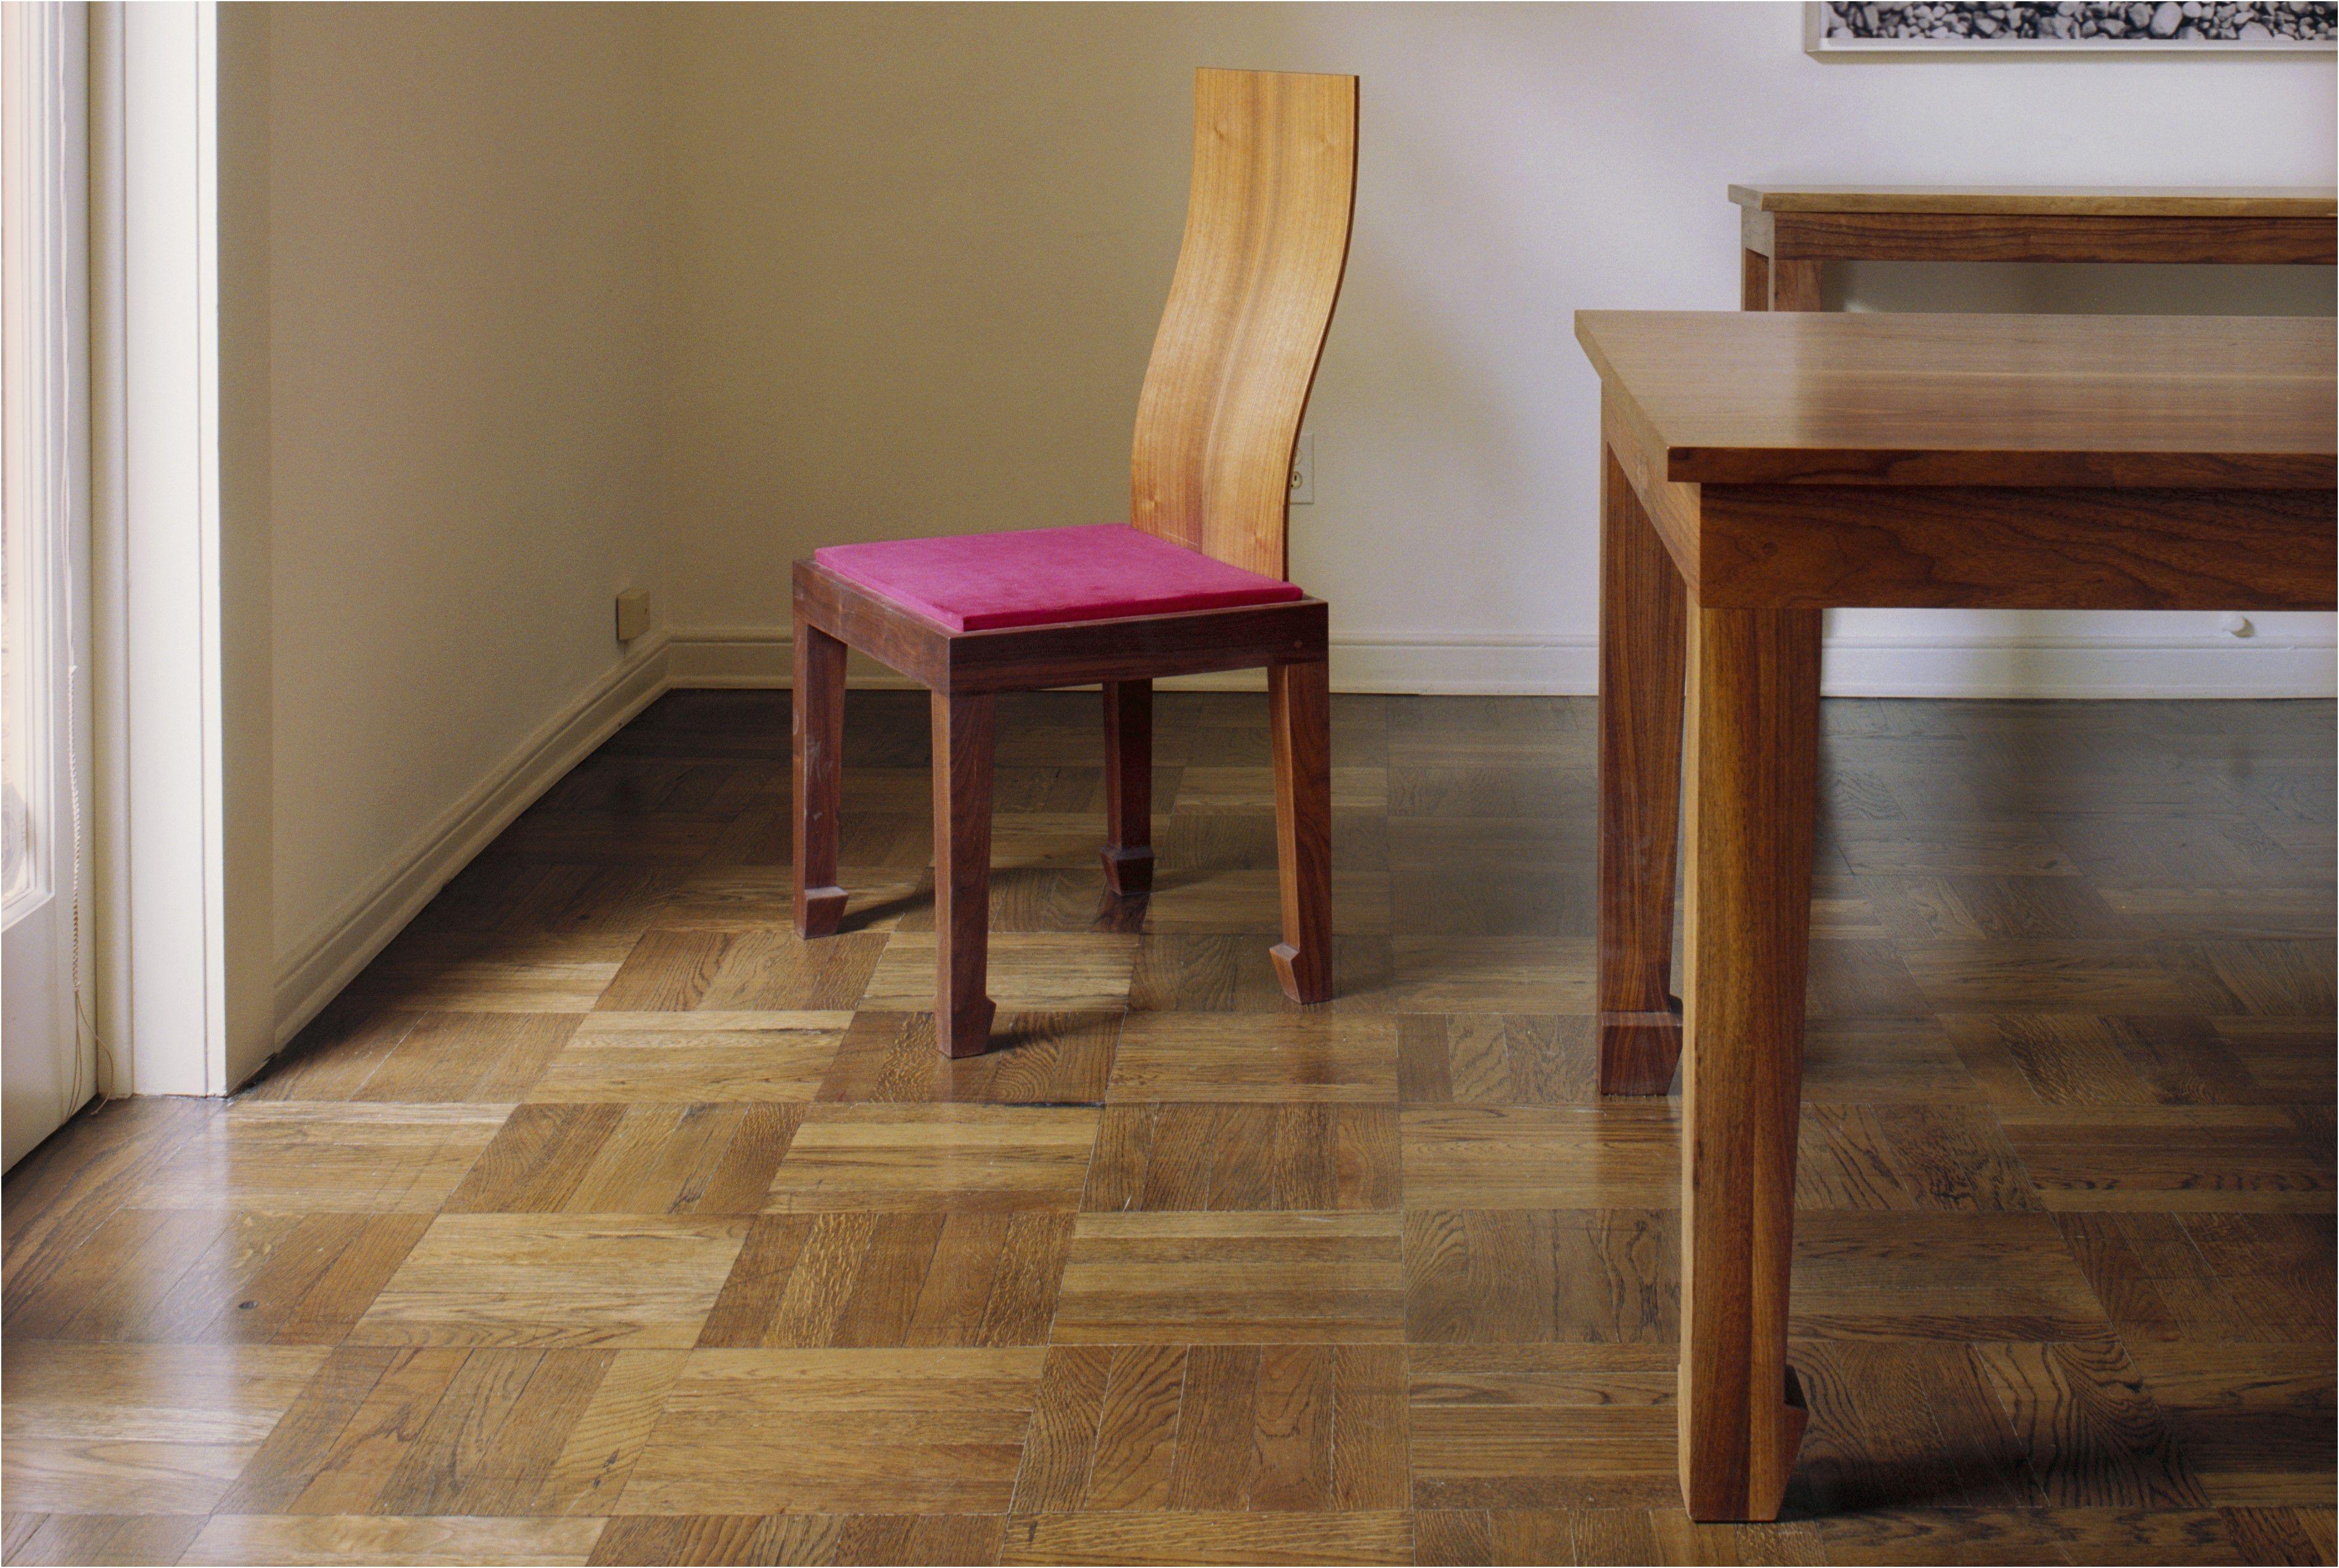 hardwood flooring jobs of hardwood flooring over ceramic tile stock 3 4 x 4 3 4 solid golden regarding hardwood flooring over ceramic tile photographies wood parquet flooring is it time to bring it back